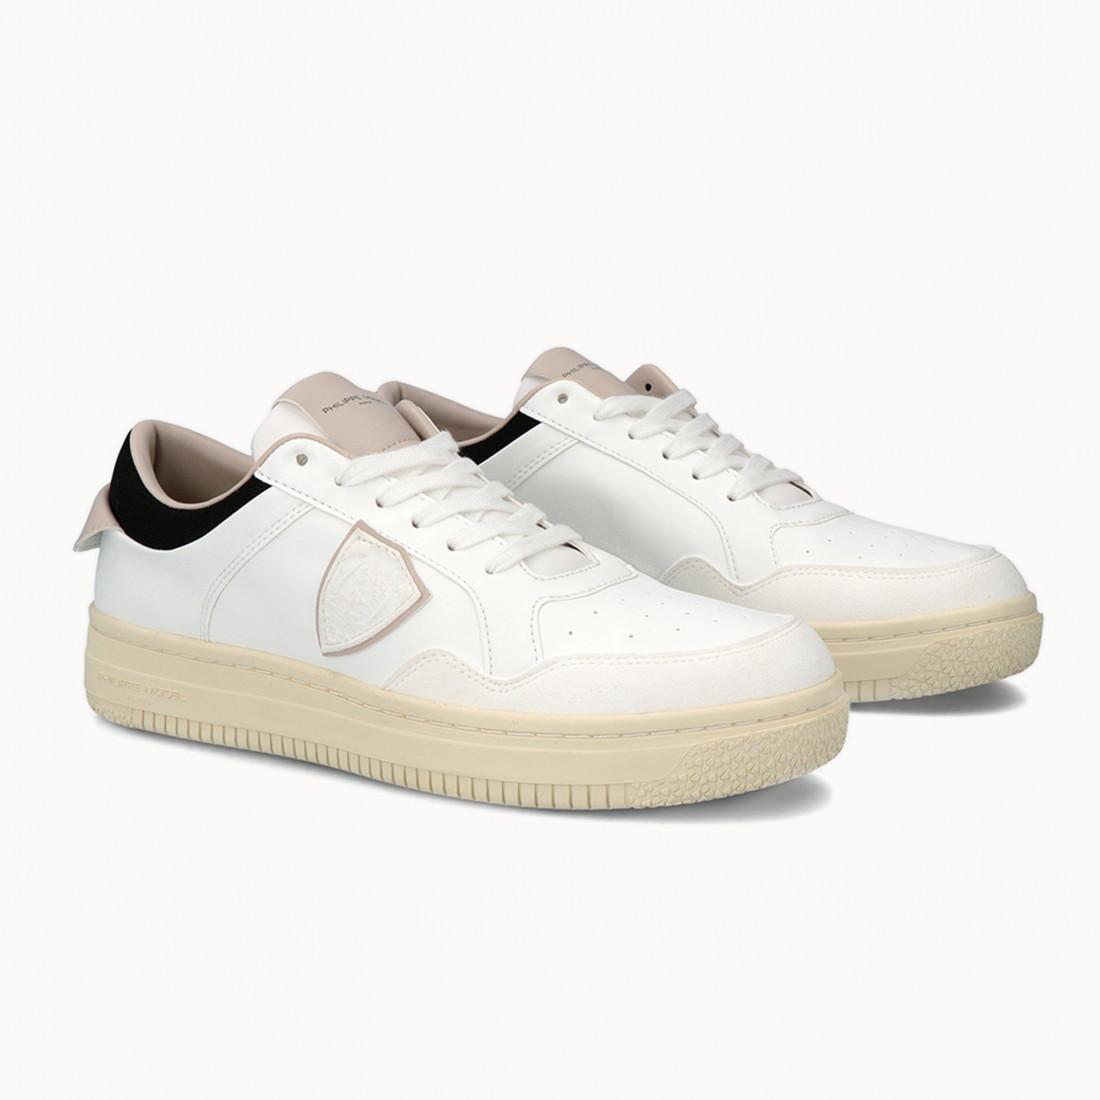 sneakers woman philippe model lyldbl corn04 8260